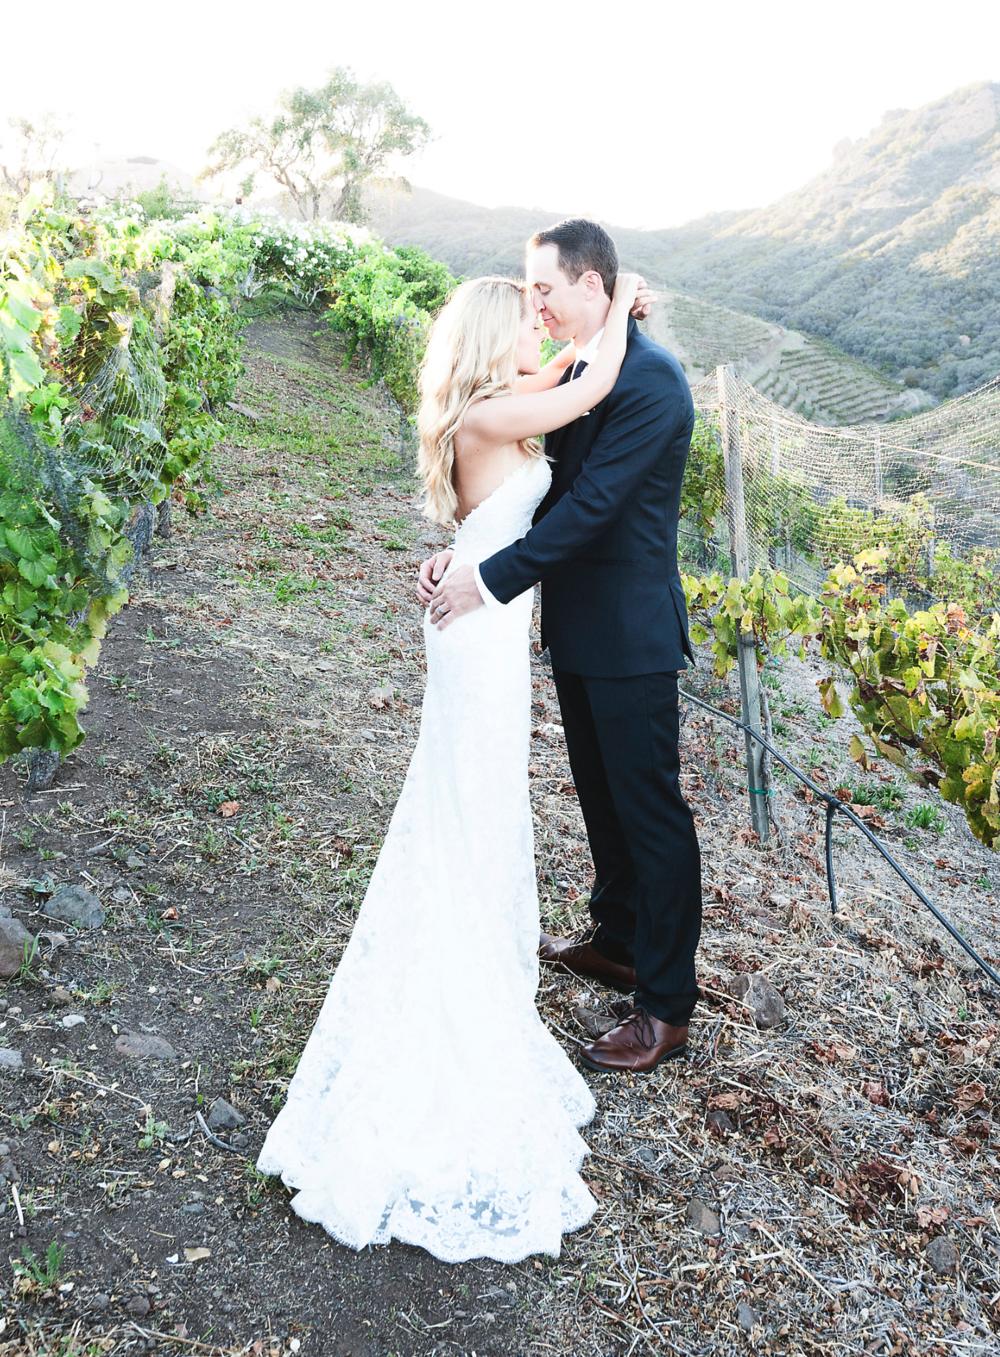 Jeff & Alicia | Fall 2015 wedding at Saddle Rock Ranch in Malibu, California